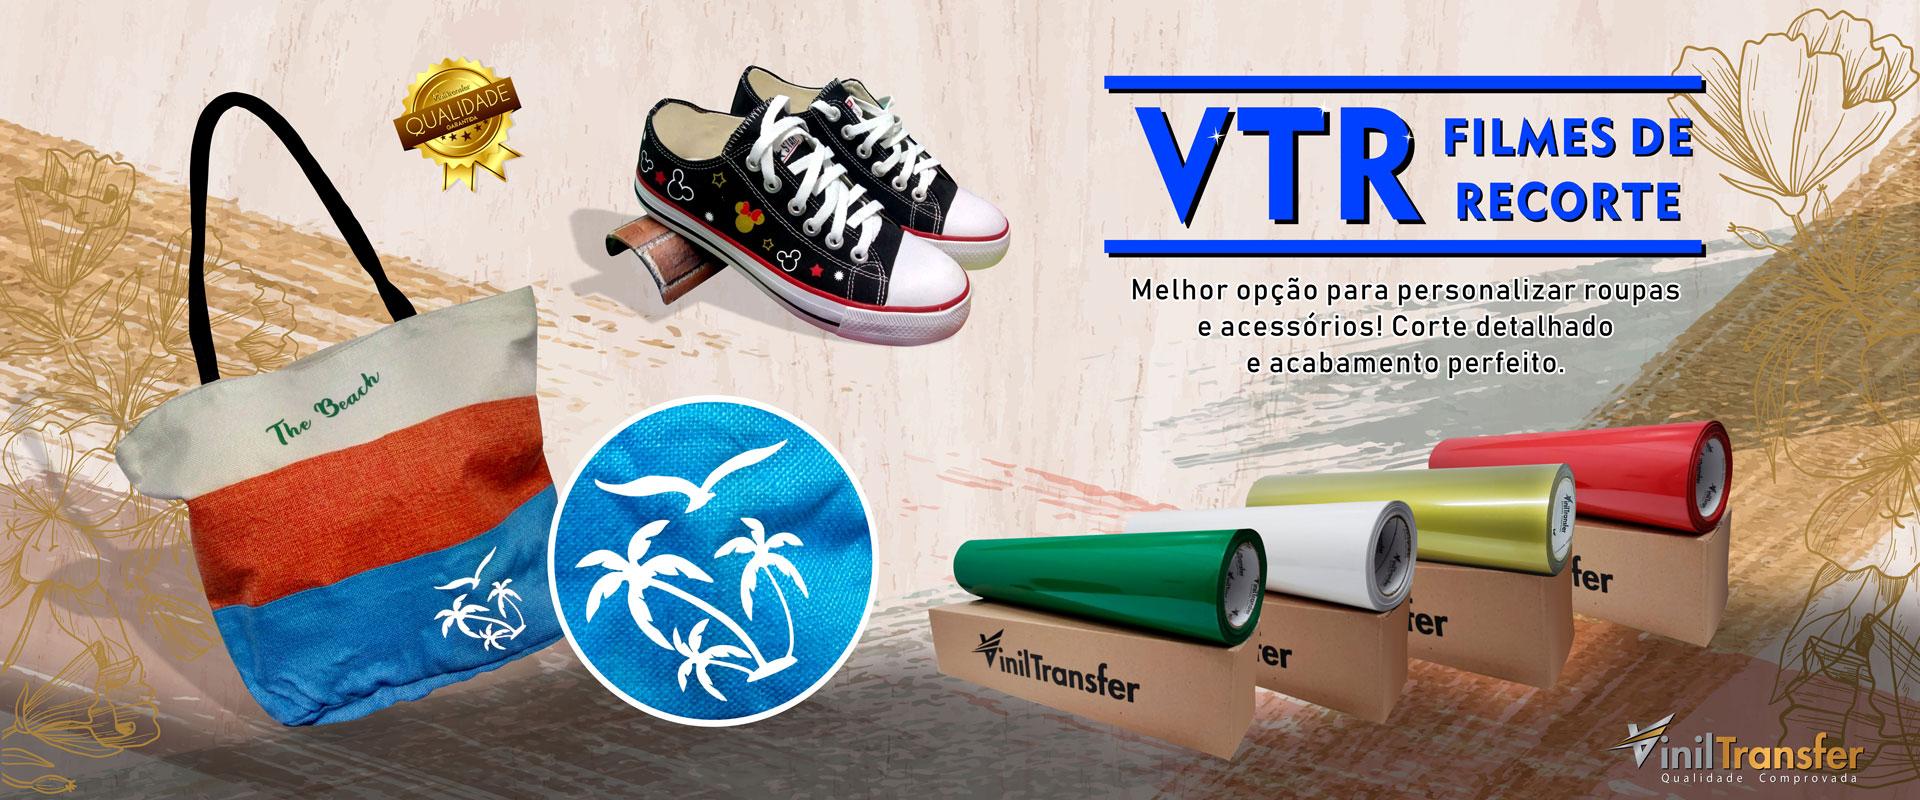 01---VTR-CORES_web